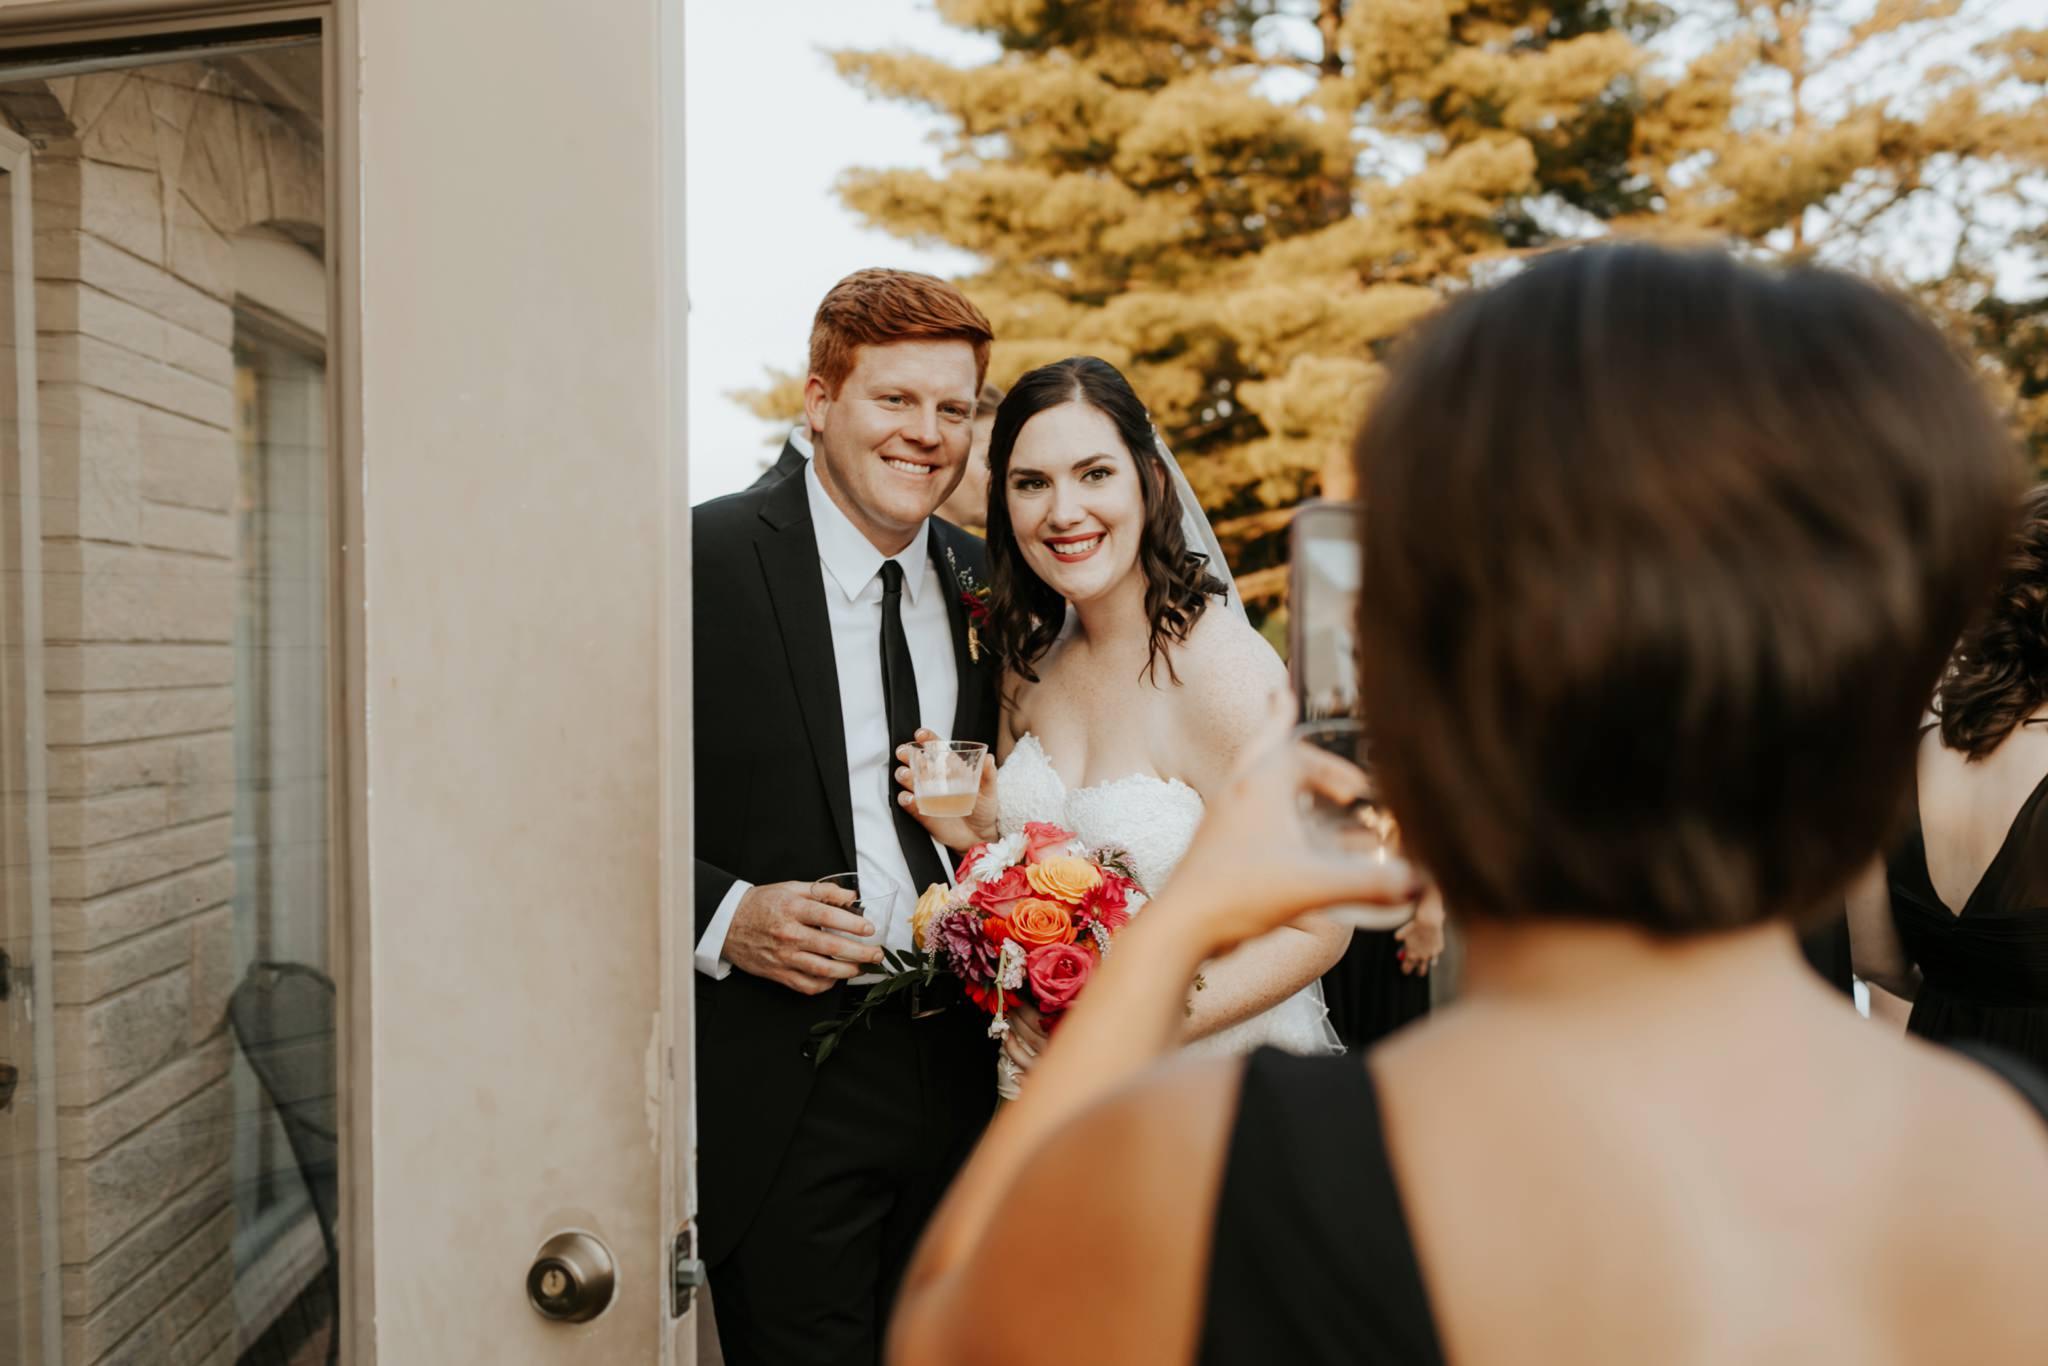 17-09-15 Lindsey and Brandon Wedding Edited-776_WEB.jpg